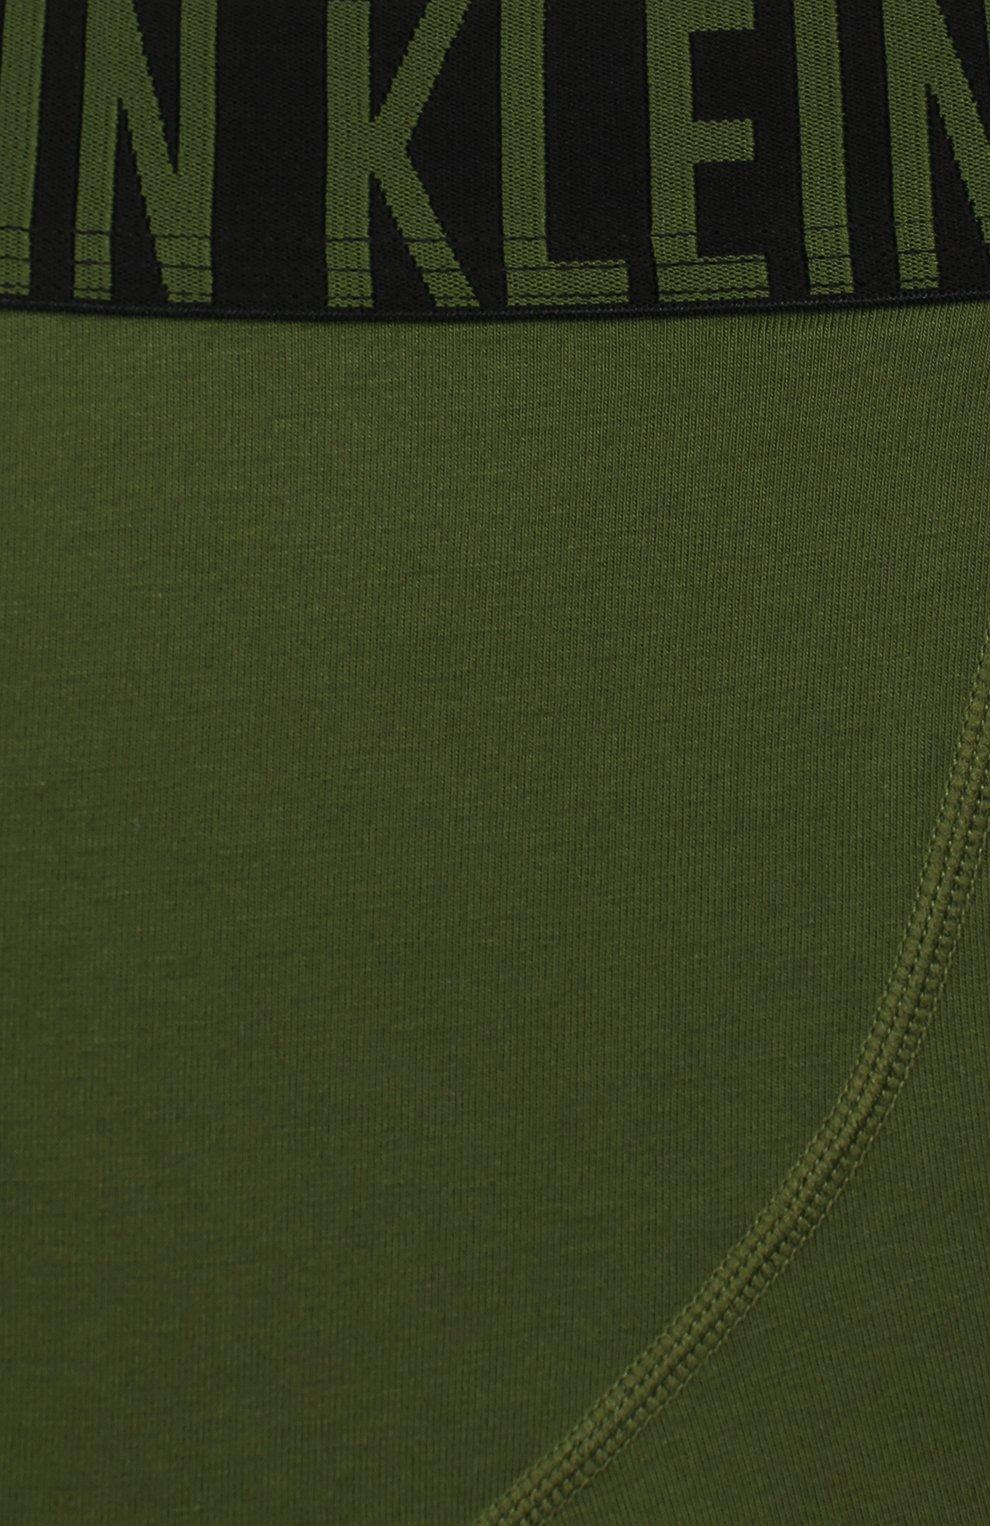 Детские трусы - 2 шт. CALVIN KLEIN хаки цвета, арт. B70B700122   Фото 3